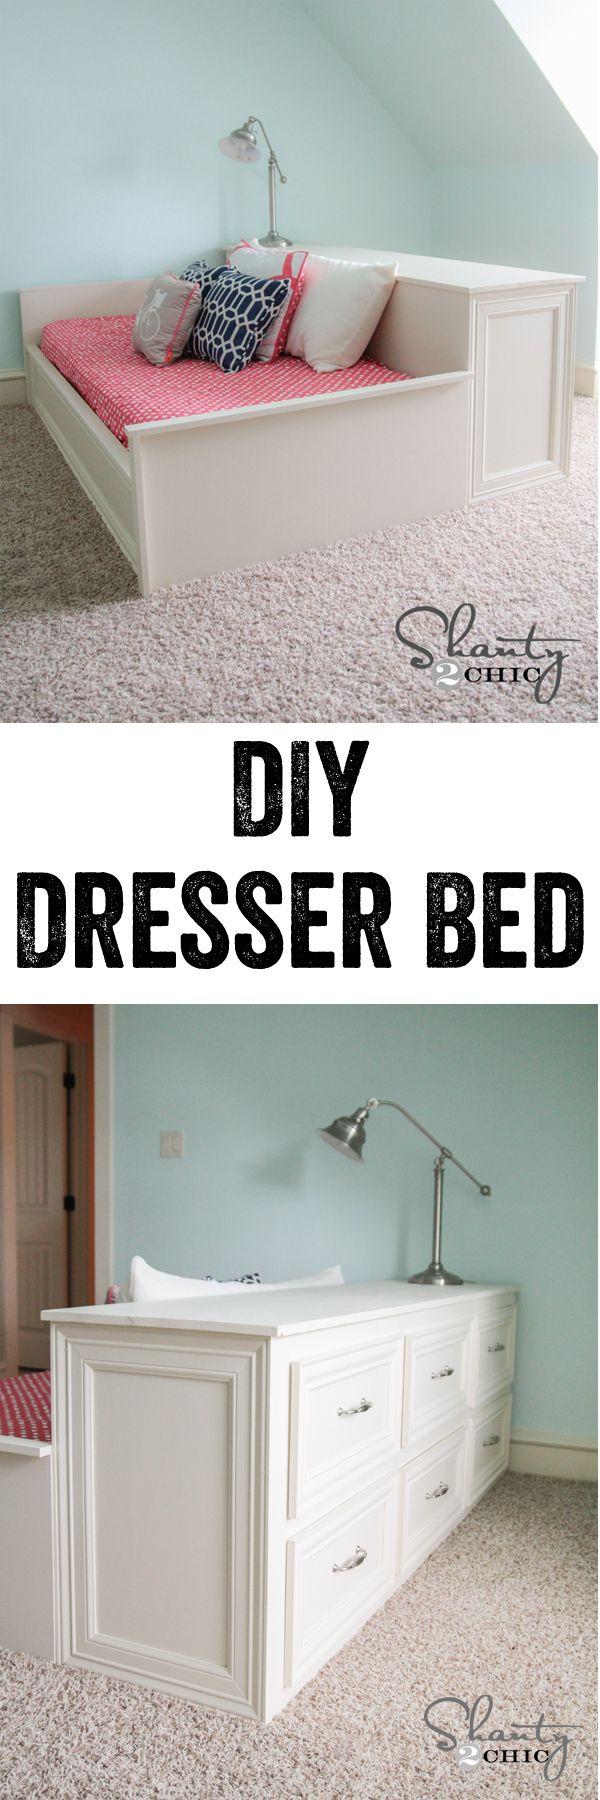 Easy 6-Drawer Dresser Free Plans! A dresser or a bed..